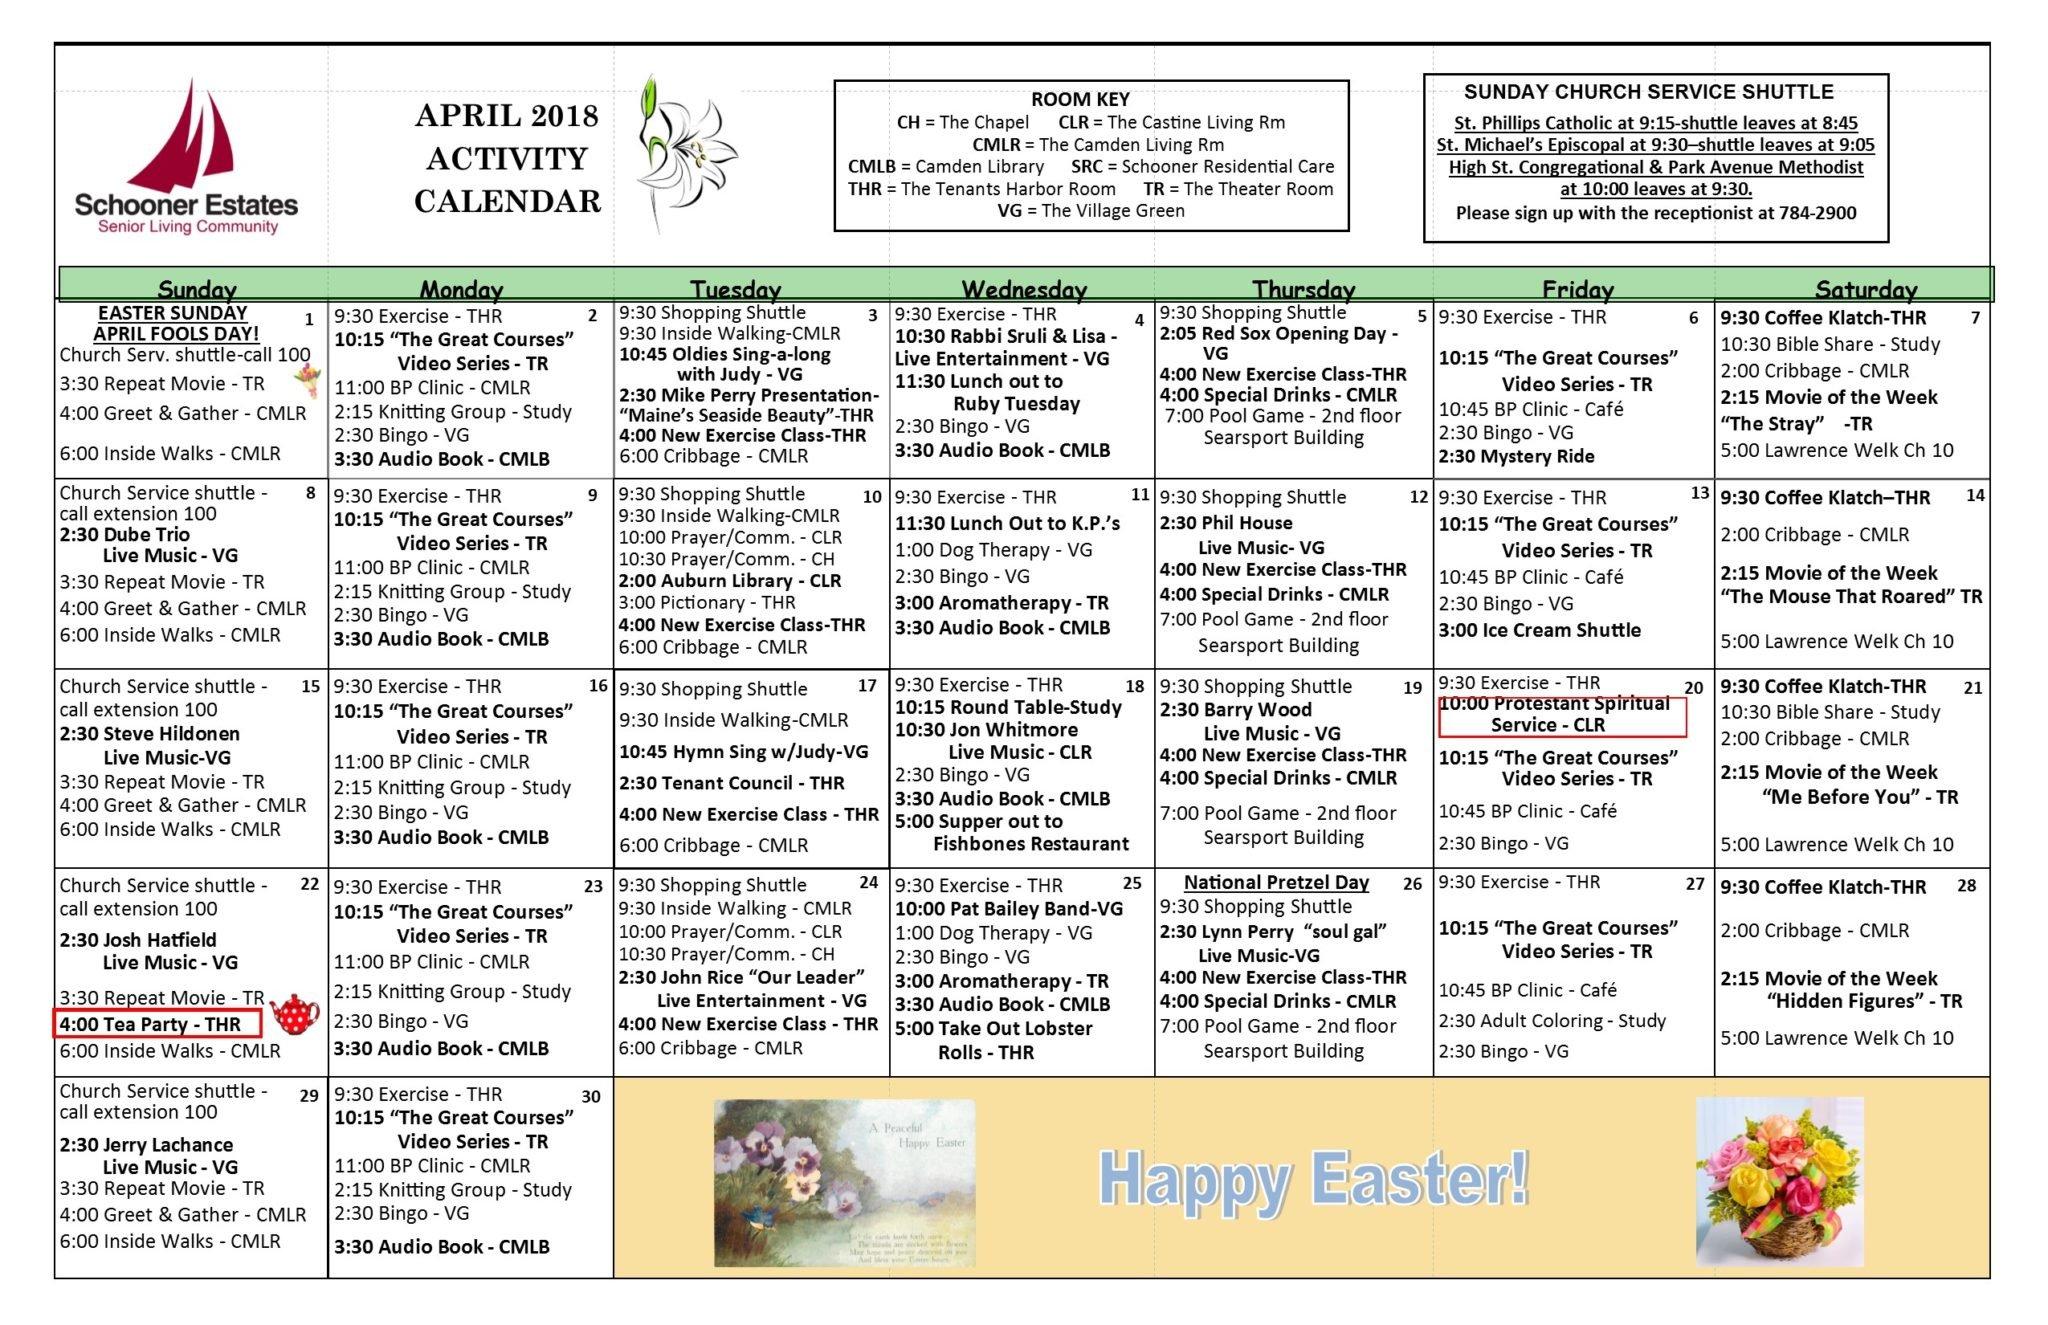 Calendar Activities 2018 : April schooner estates activity calendars